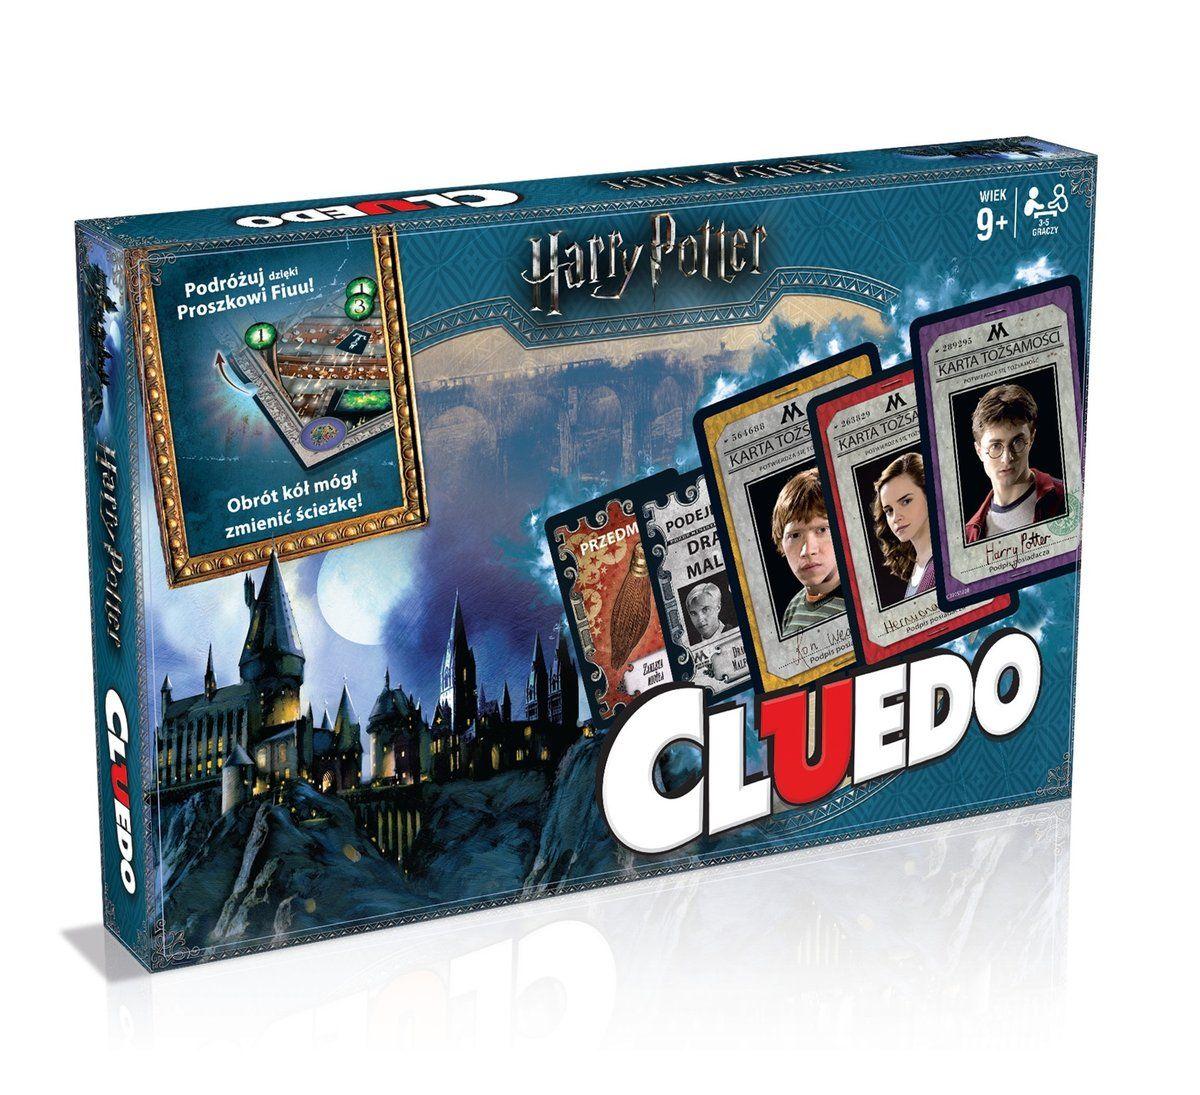 Winning Moves Gra Logiczna Cluedo Harry Potter Harry Potter Games Harry Potter Cluedo Mystery Games